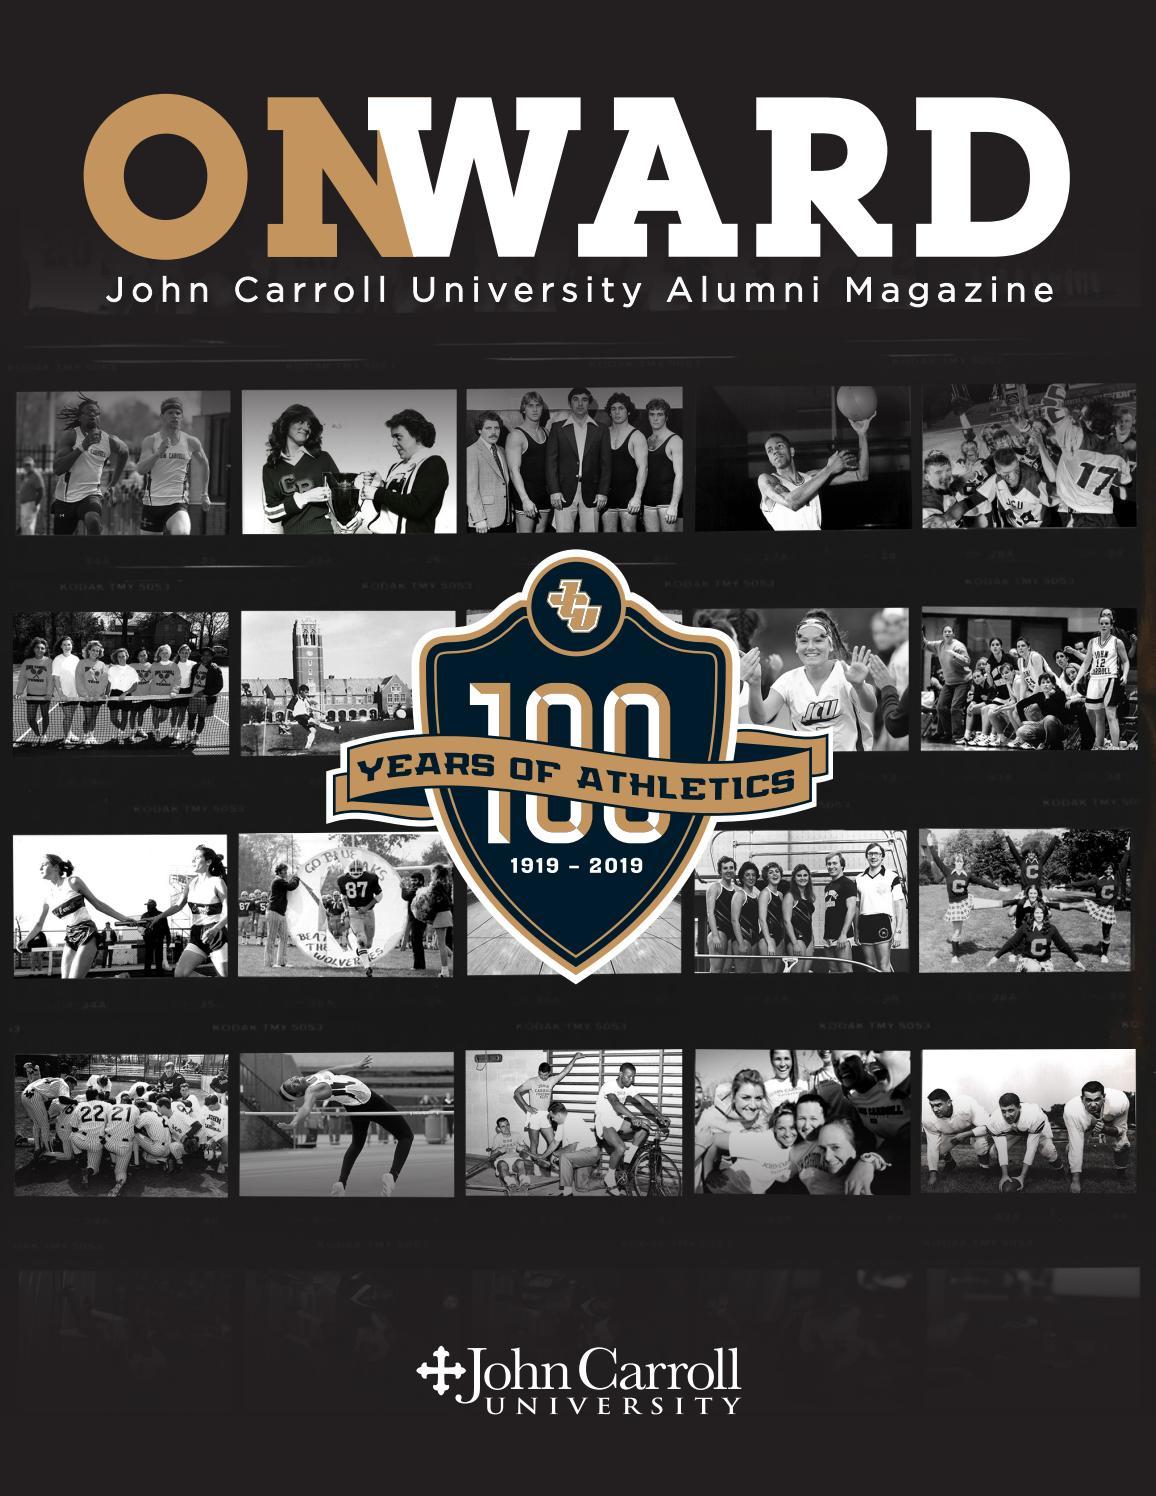 Onward Alumni Magazine Fall 2019 By John Carroll University Issuu